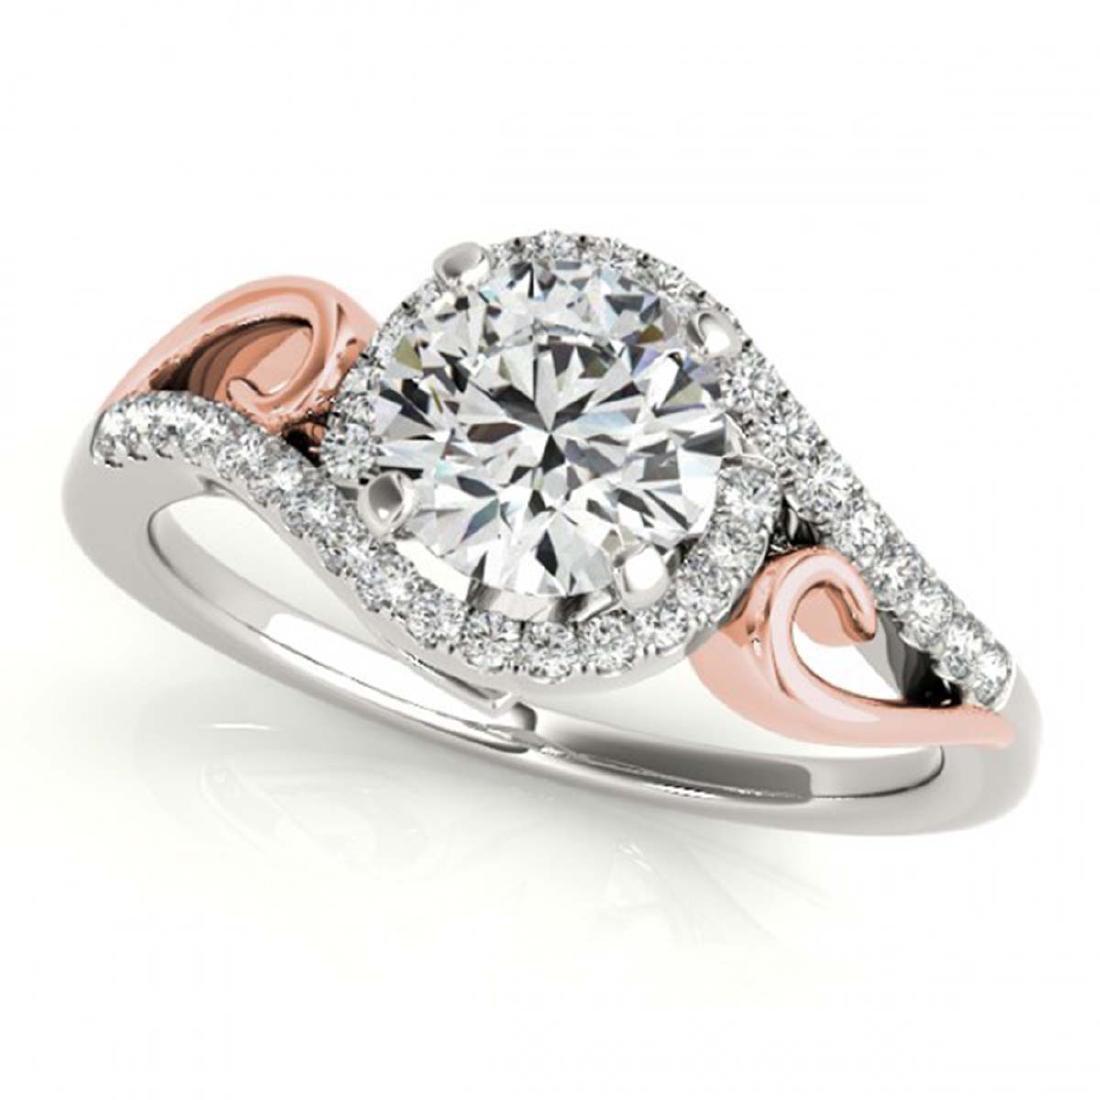 1 ctw VS/SI Diamond Solitaire Halo Ring 18K White &